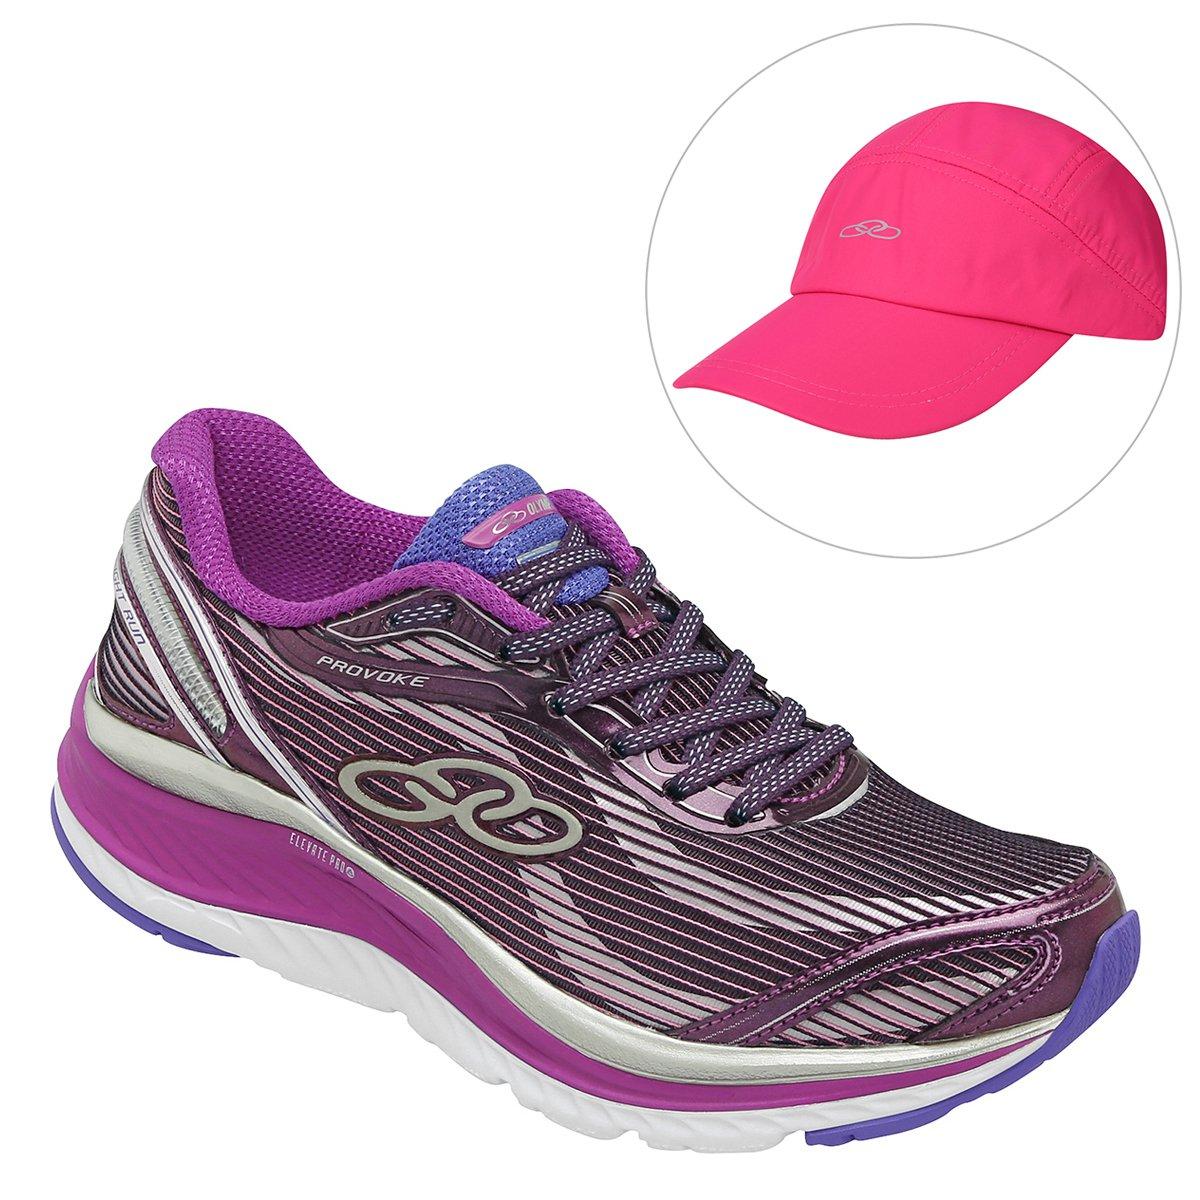 cc86535ccf3 Kit Tênis Olympikus Provoke Feminino + Boné Olympikus Aba Curva Essential - Compre  Agora